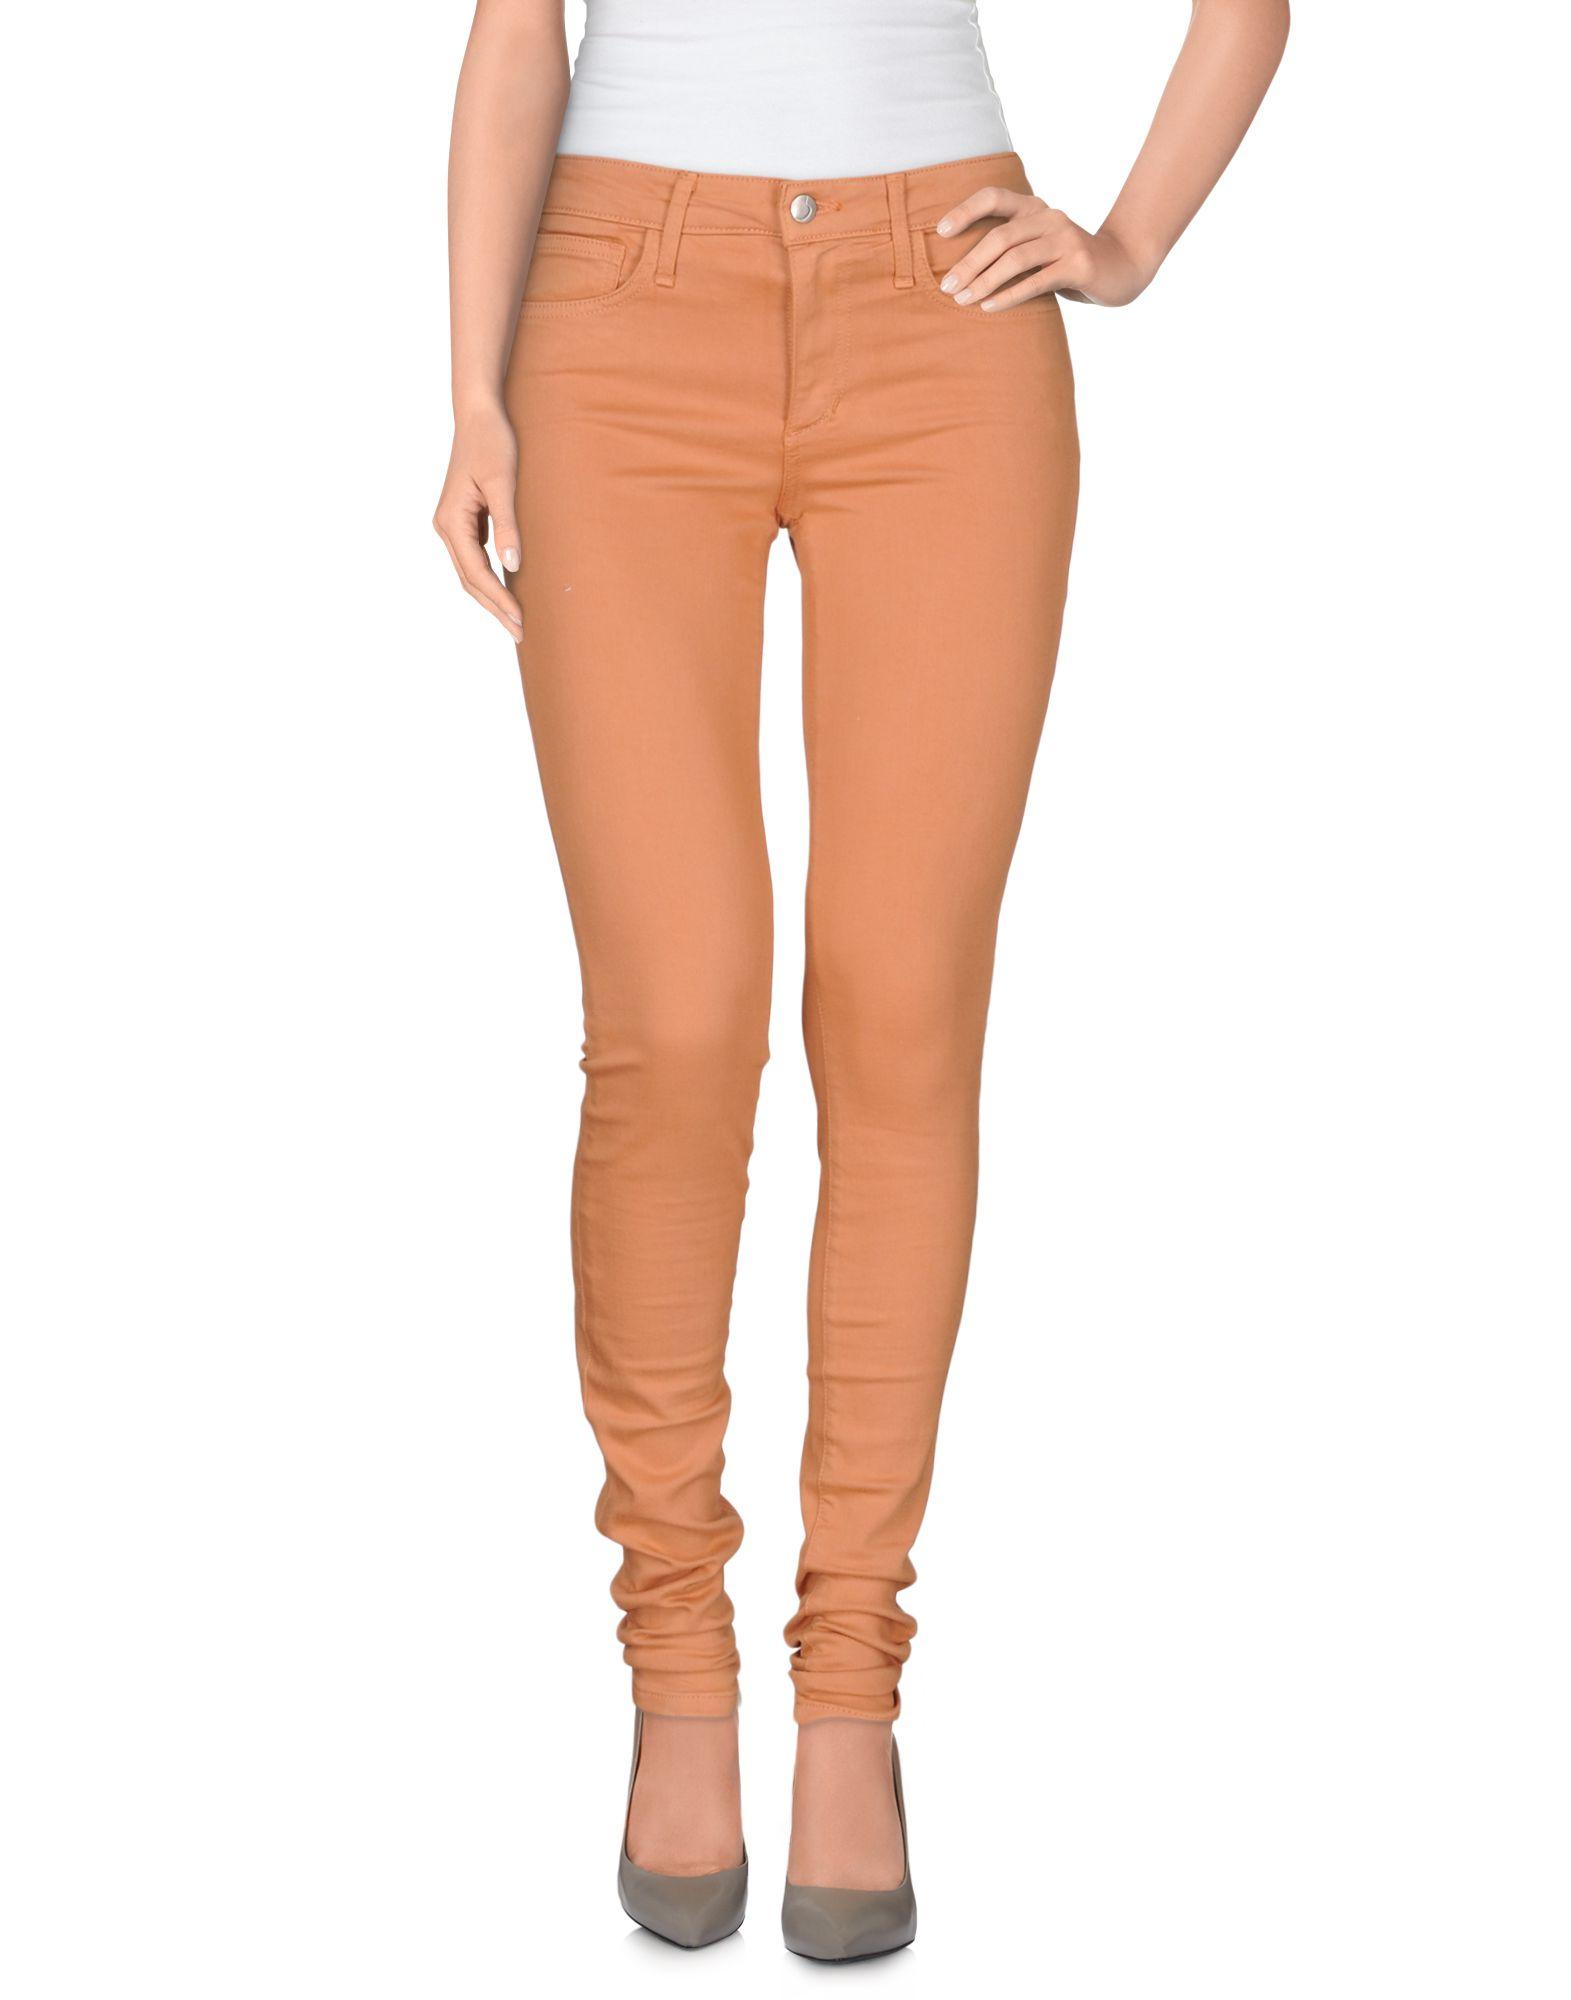 Joeu0026#39;s jeans Denim Pants in Orange | Lyst